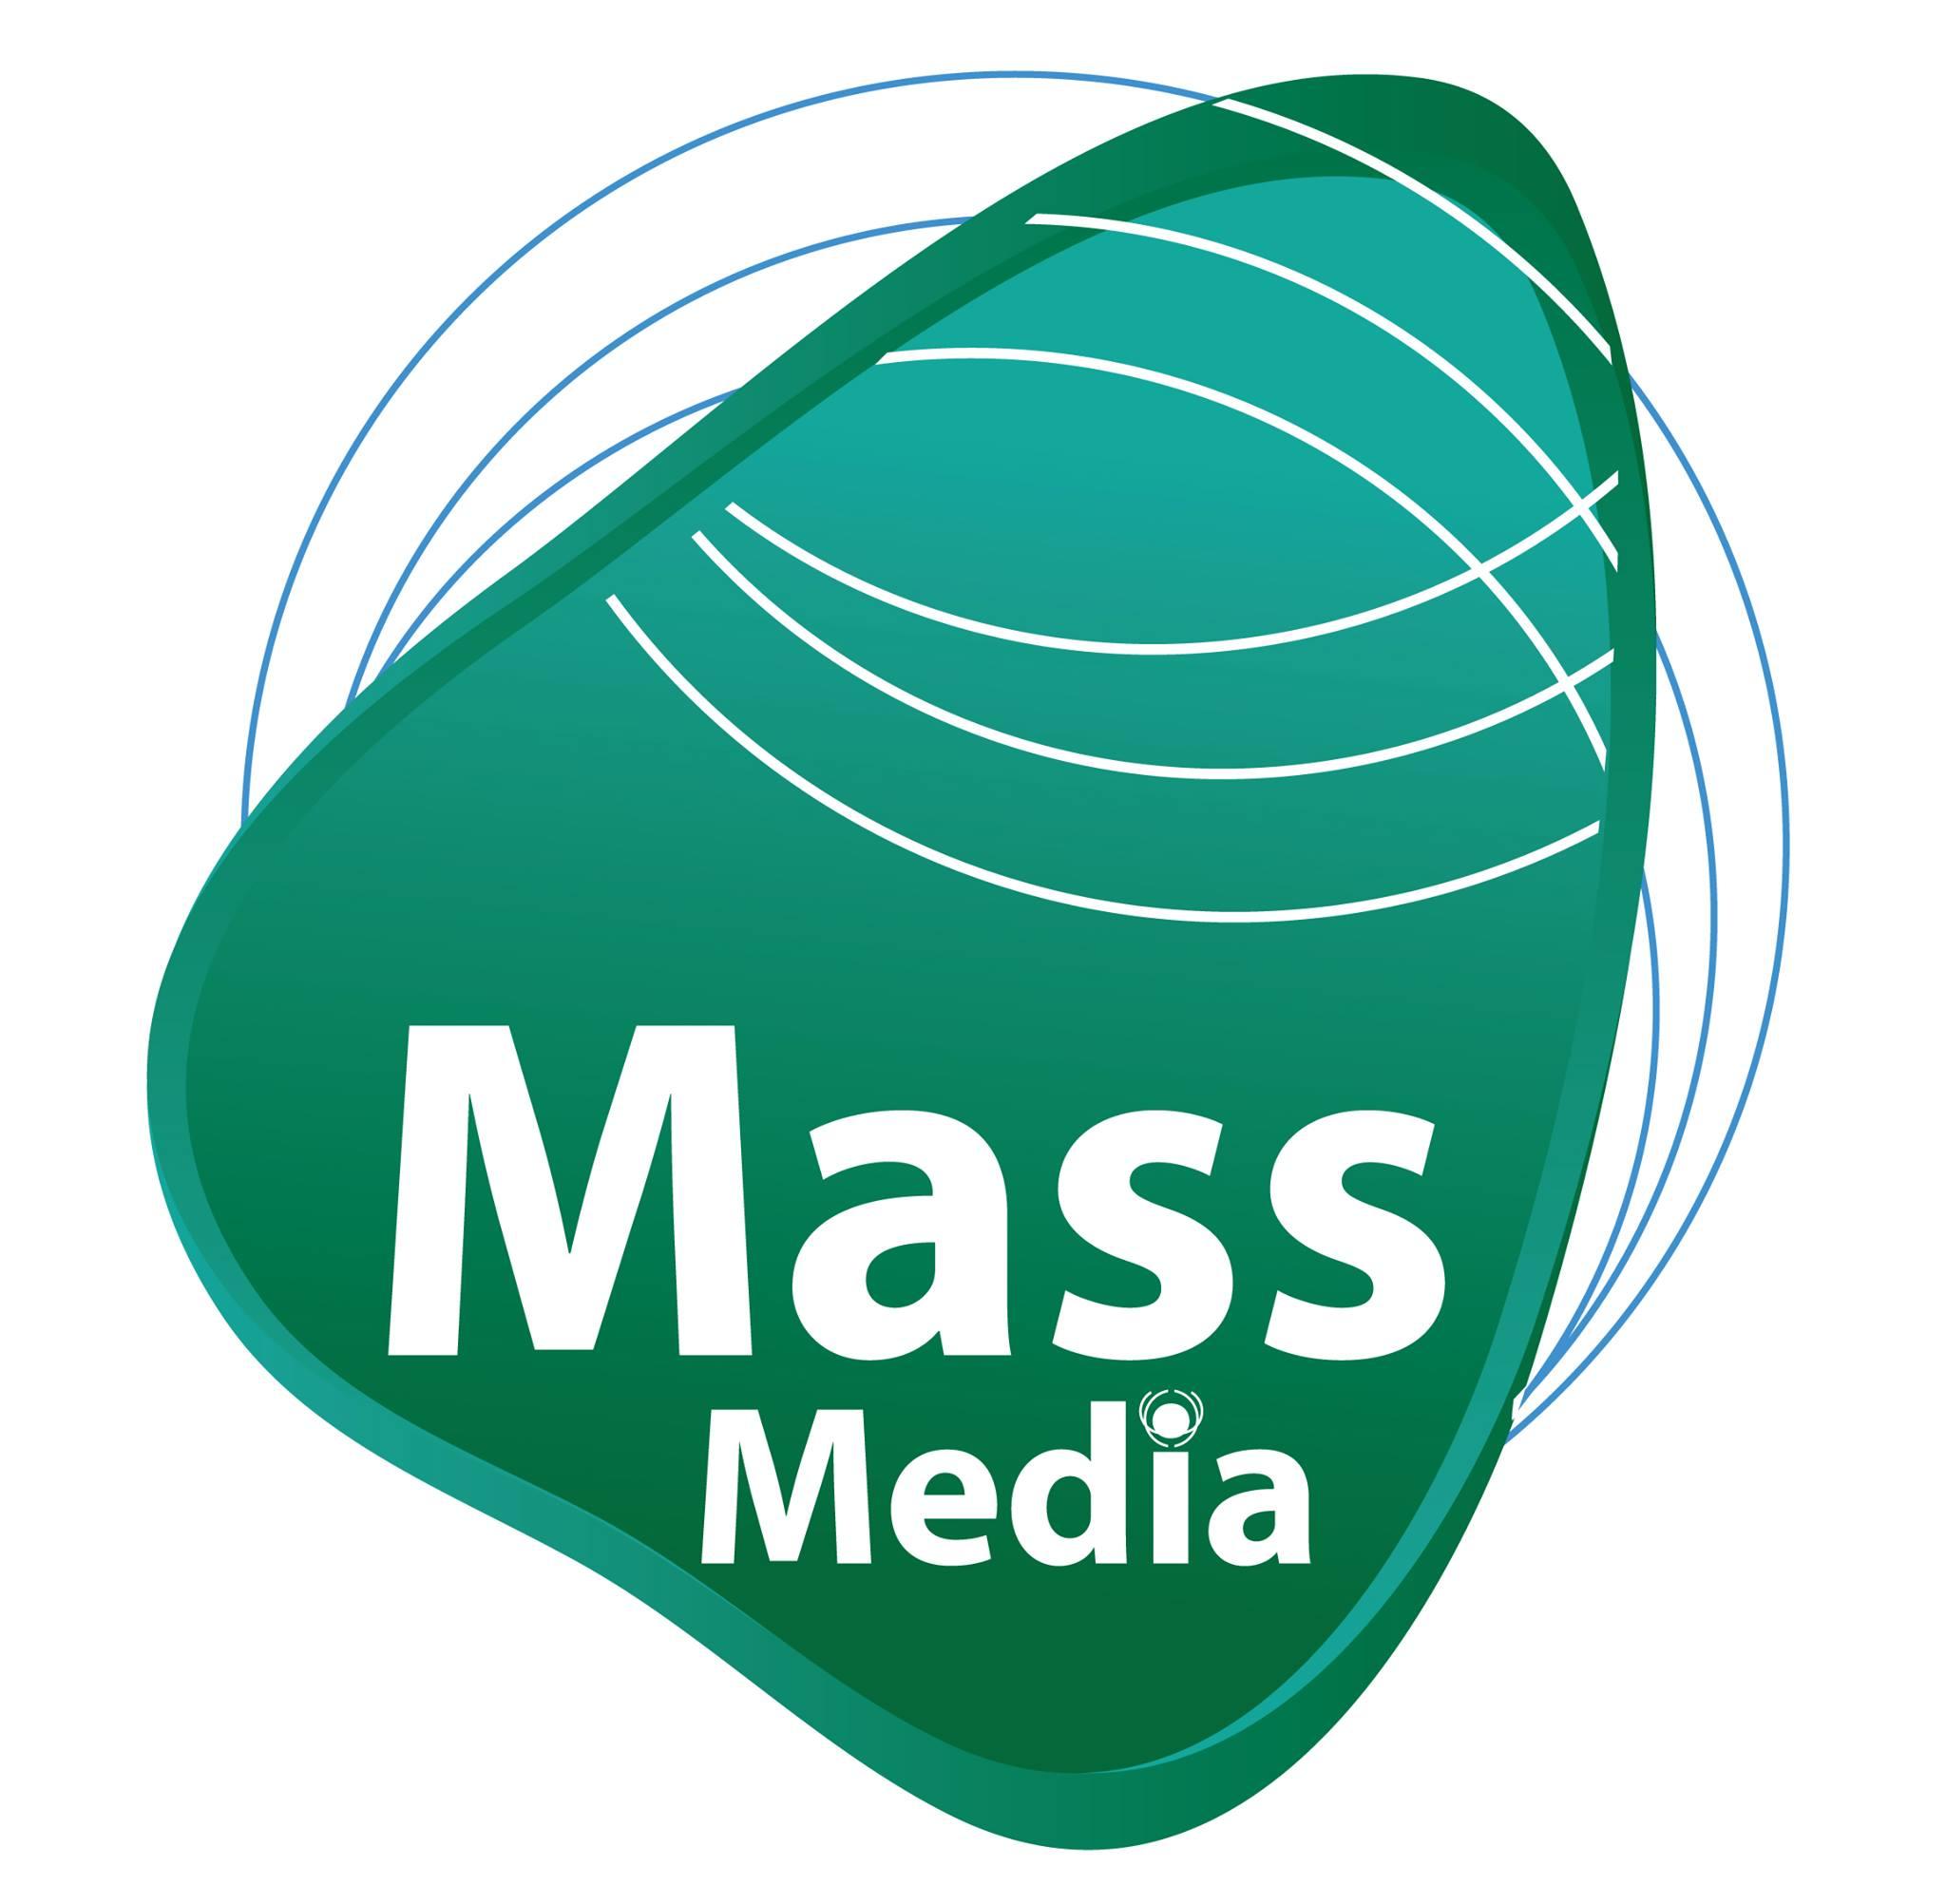 MASSMEDIA COMUNICAZIONE, l'agenzia di stampa e ufficio stampa cresce in numeri e si fa sempre piu' social